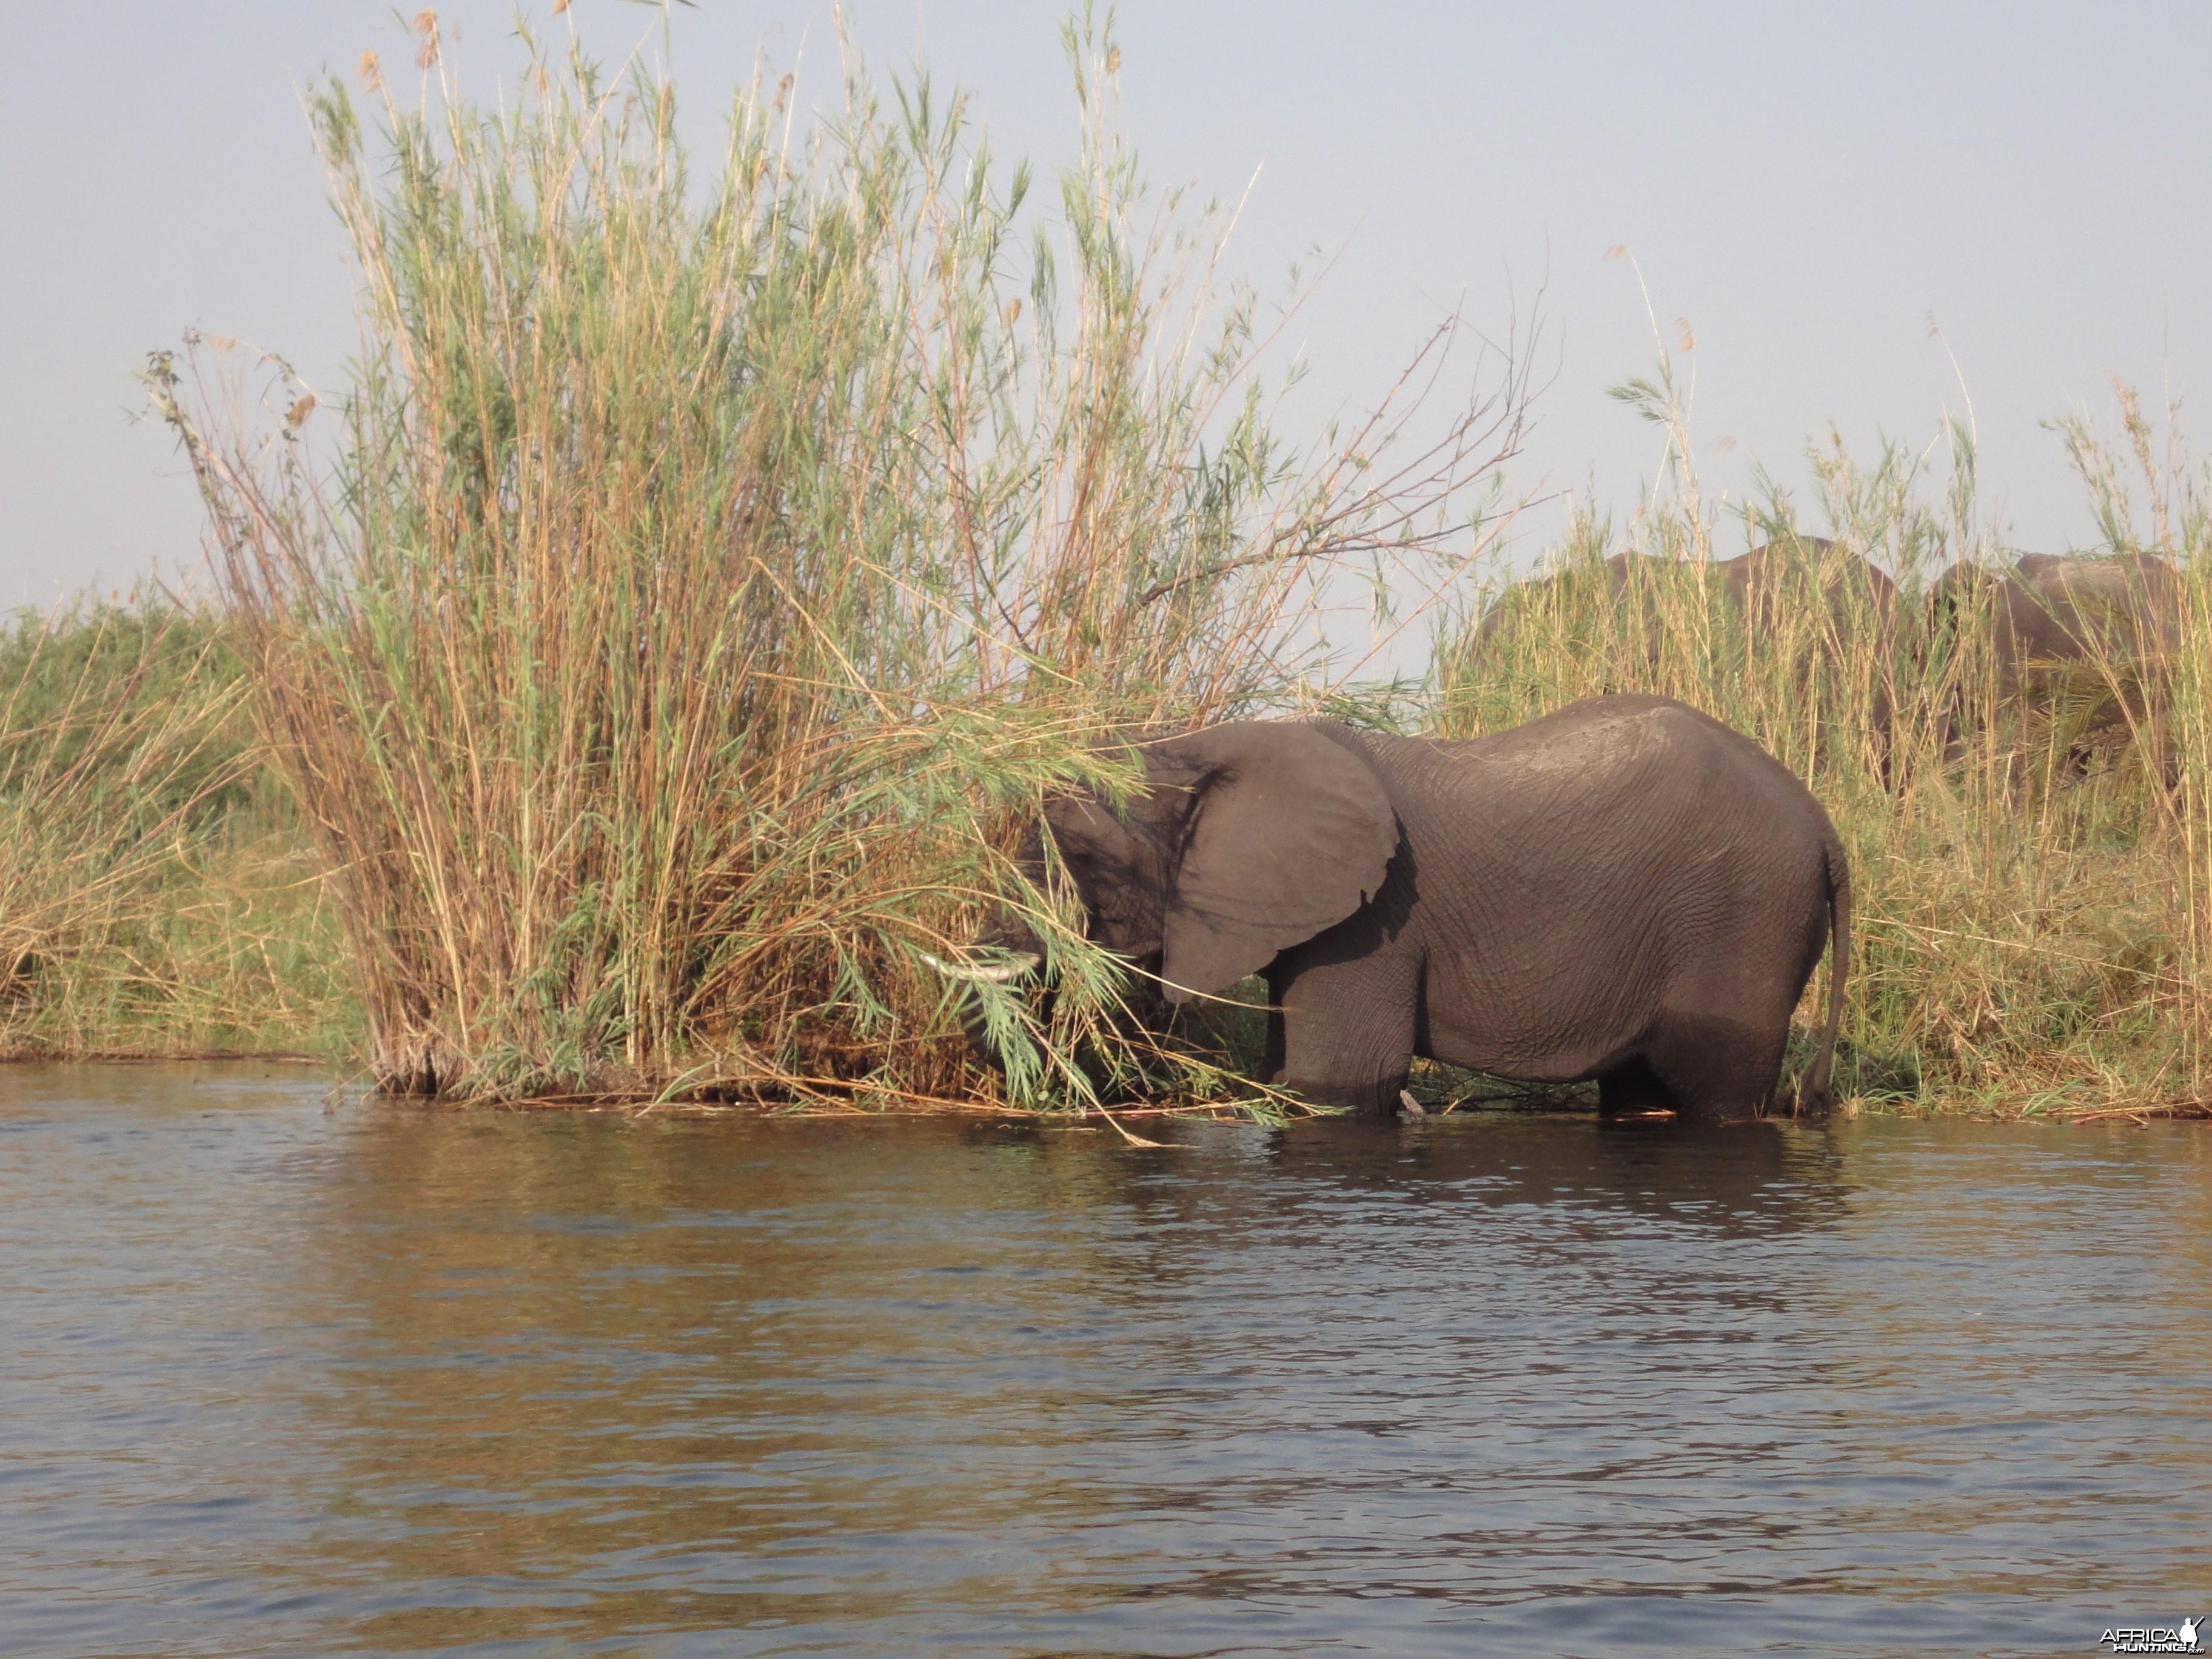 Elephant Caprivi Namibia